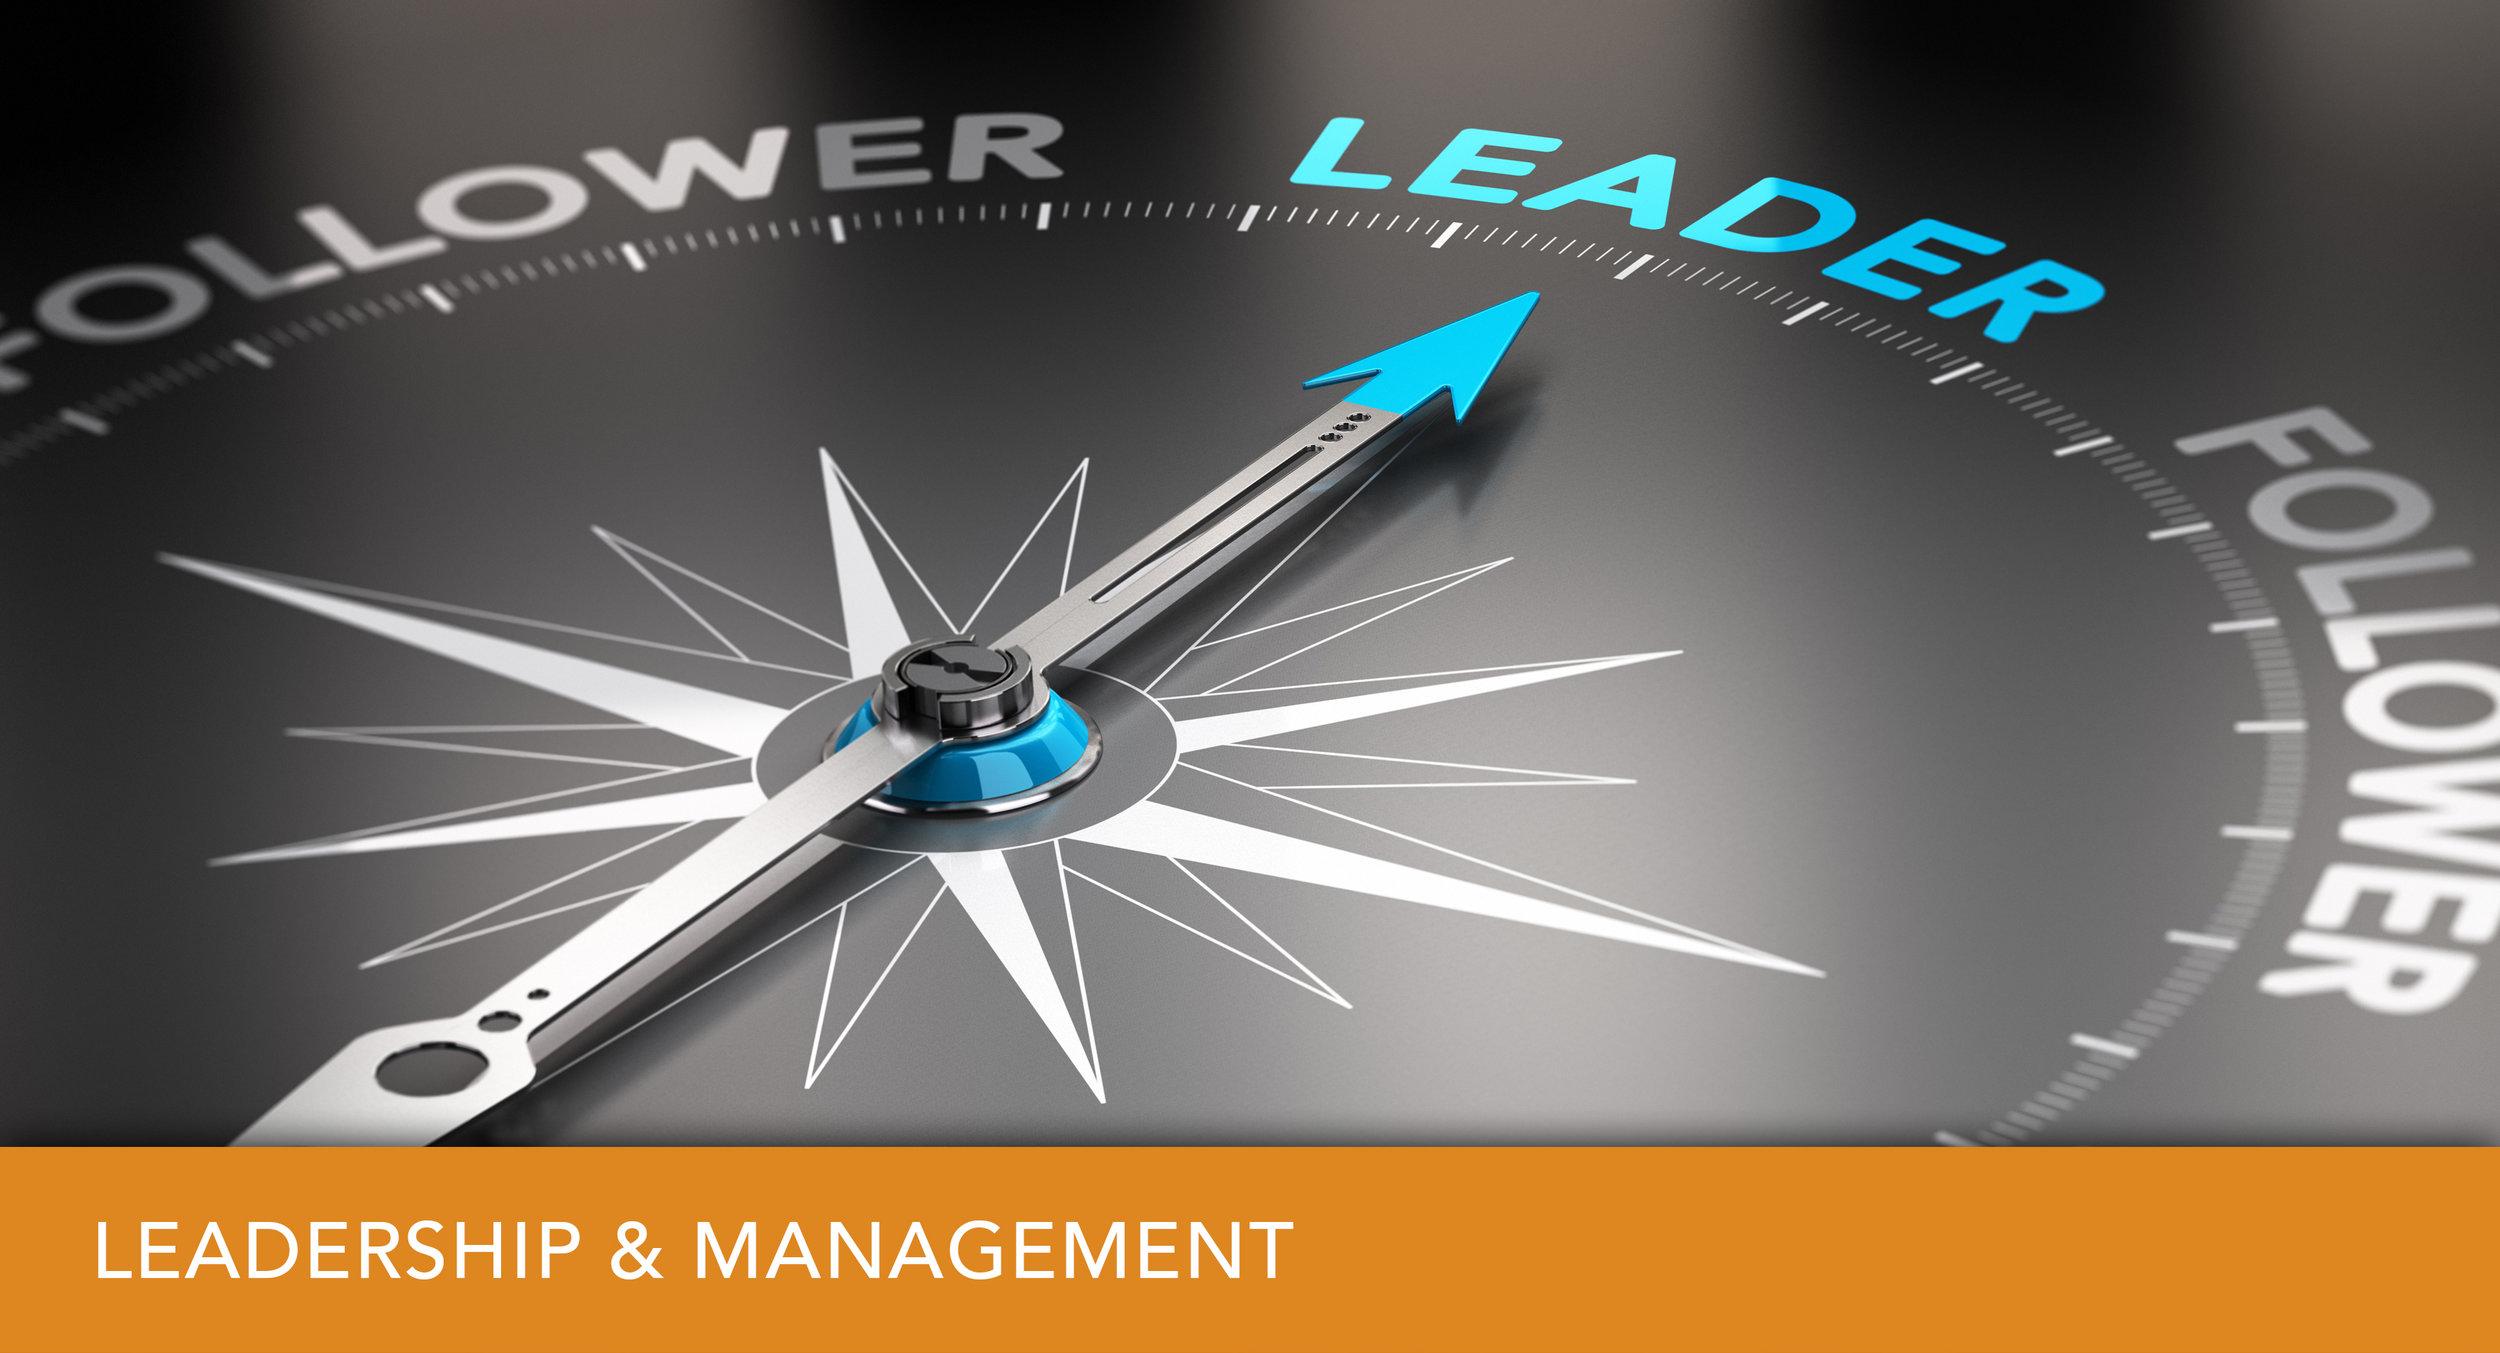 Leadership_and_management.jpg